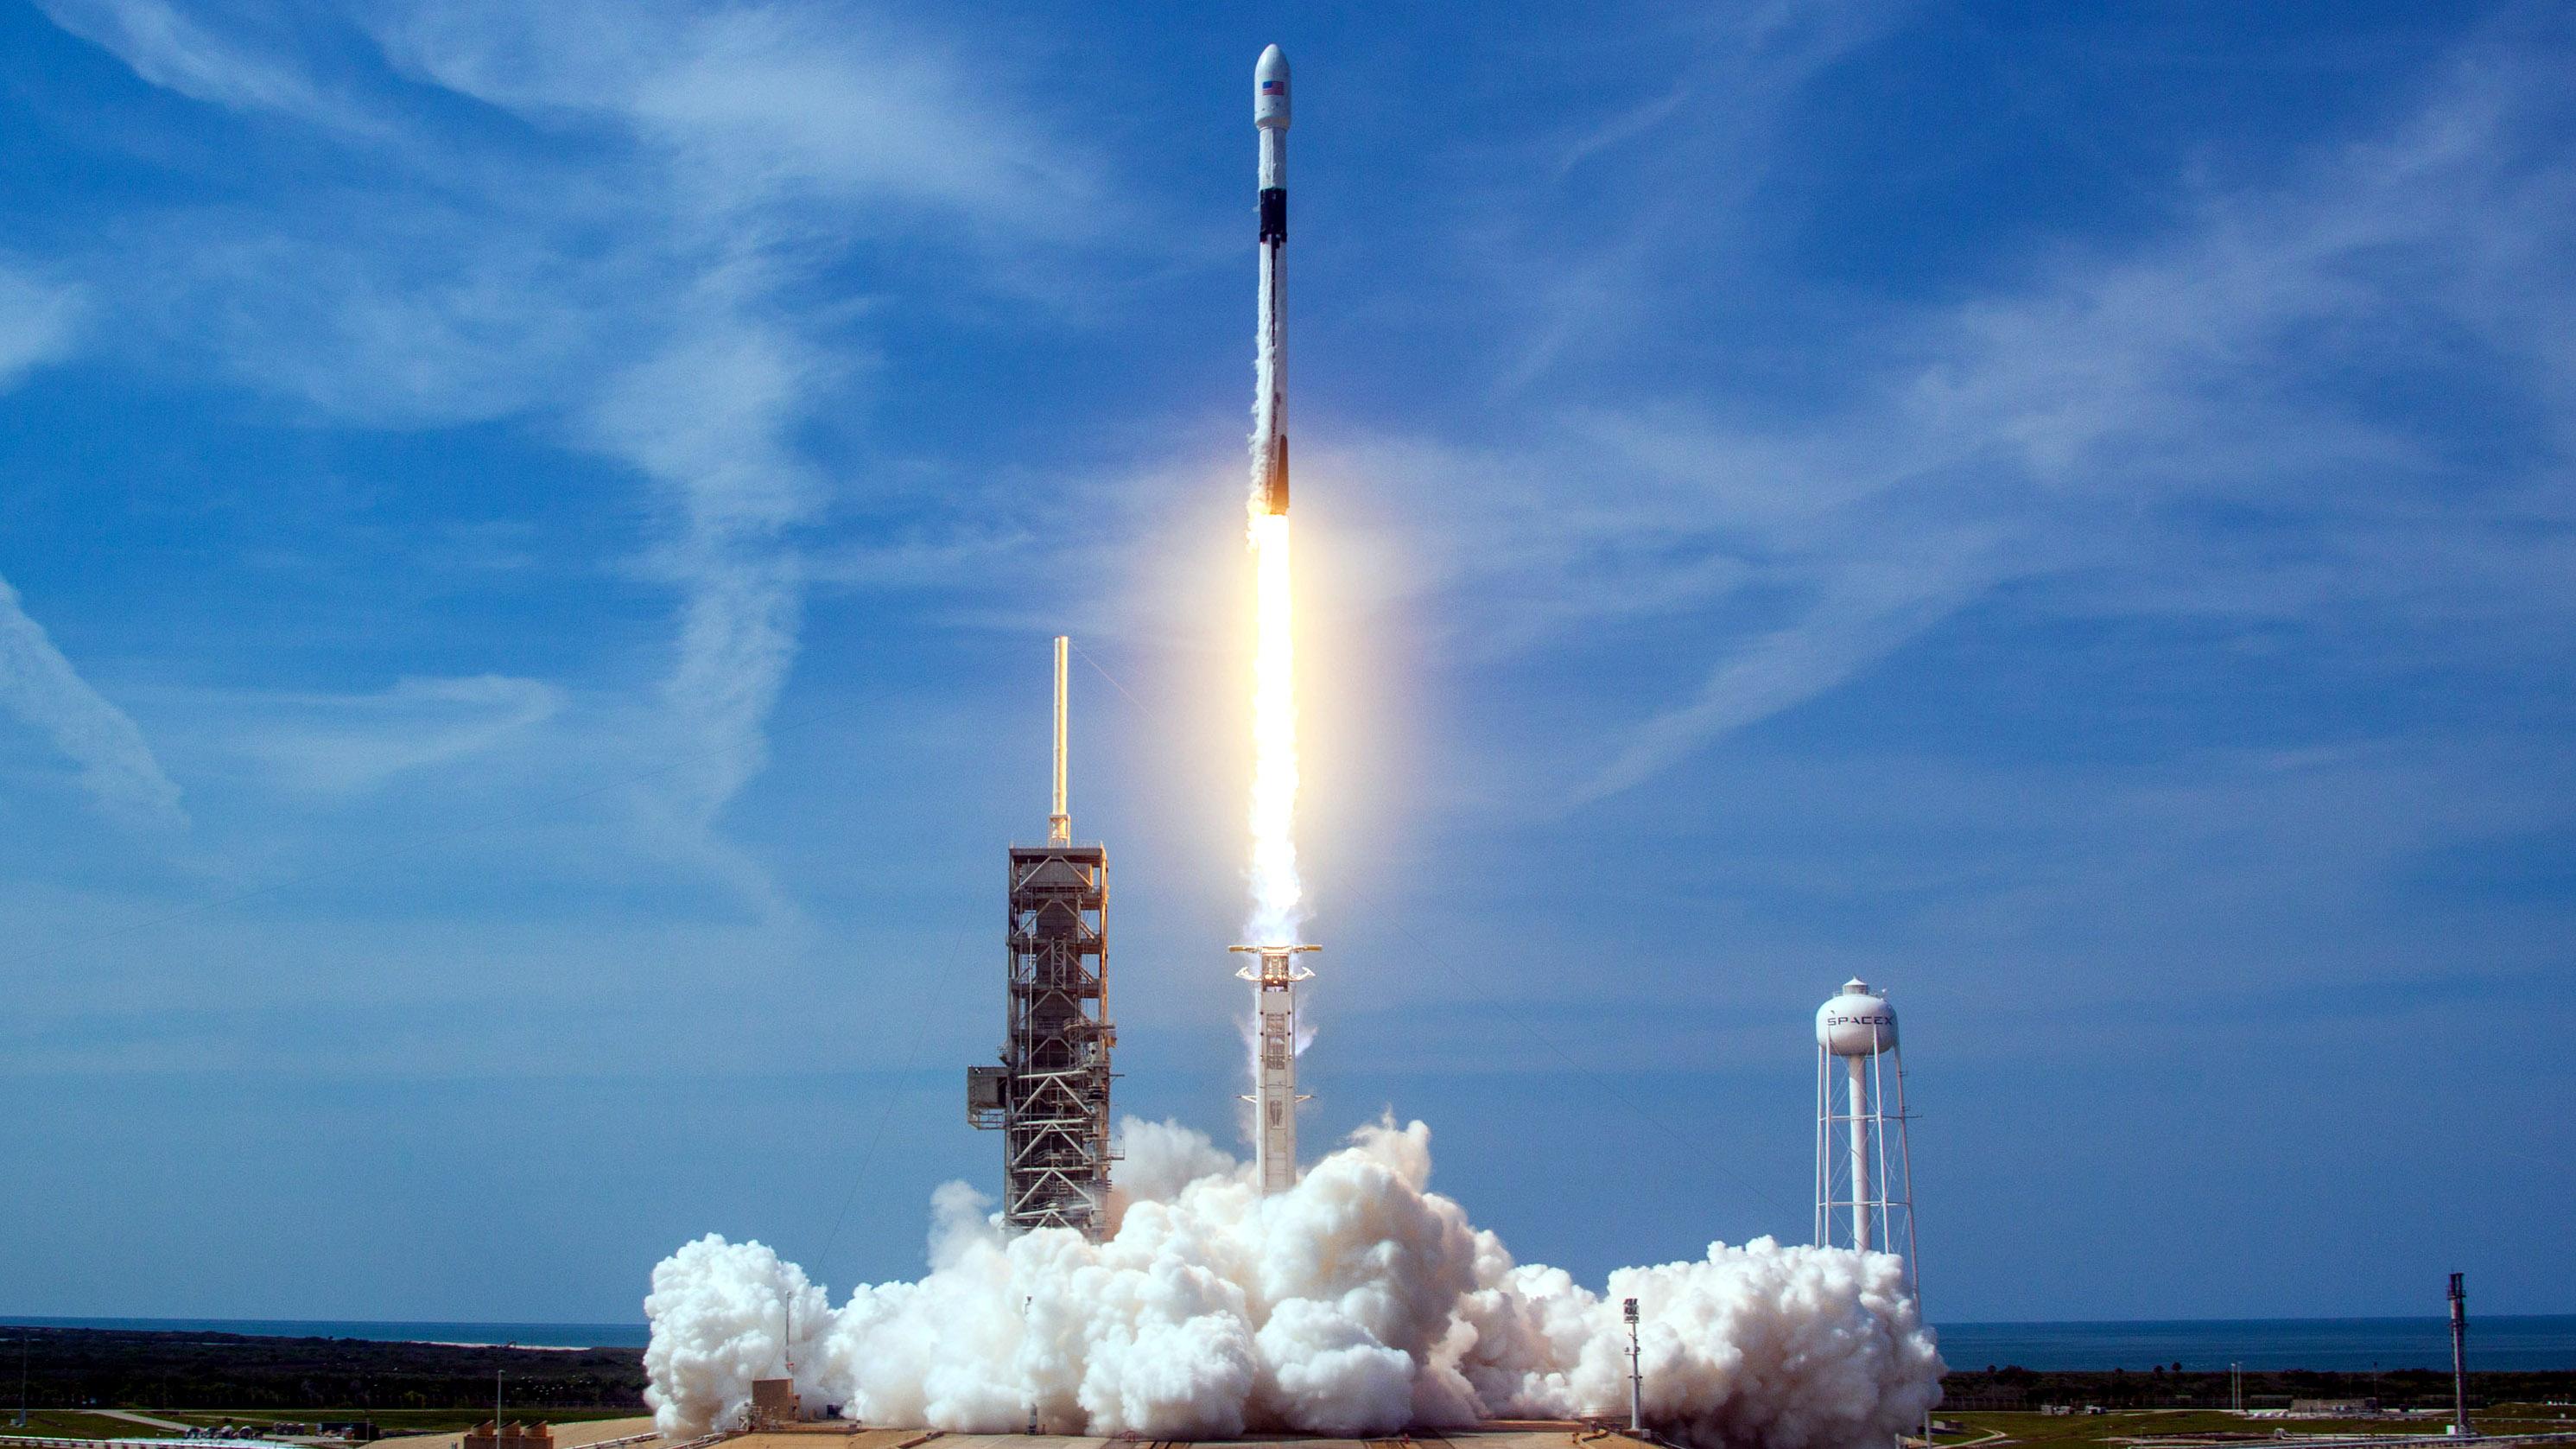 Watch Elon Musk's SpaceX return to orbit with its Telstar ...